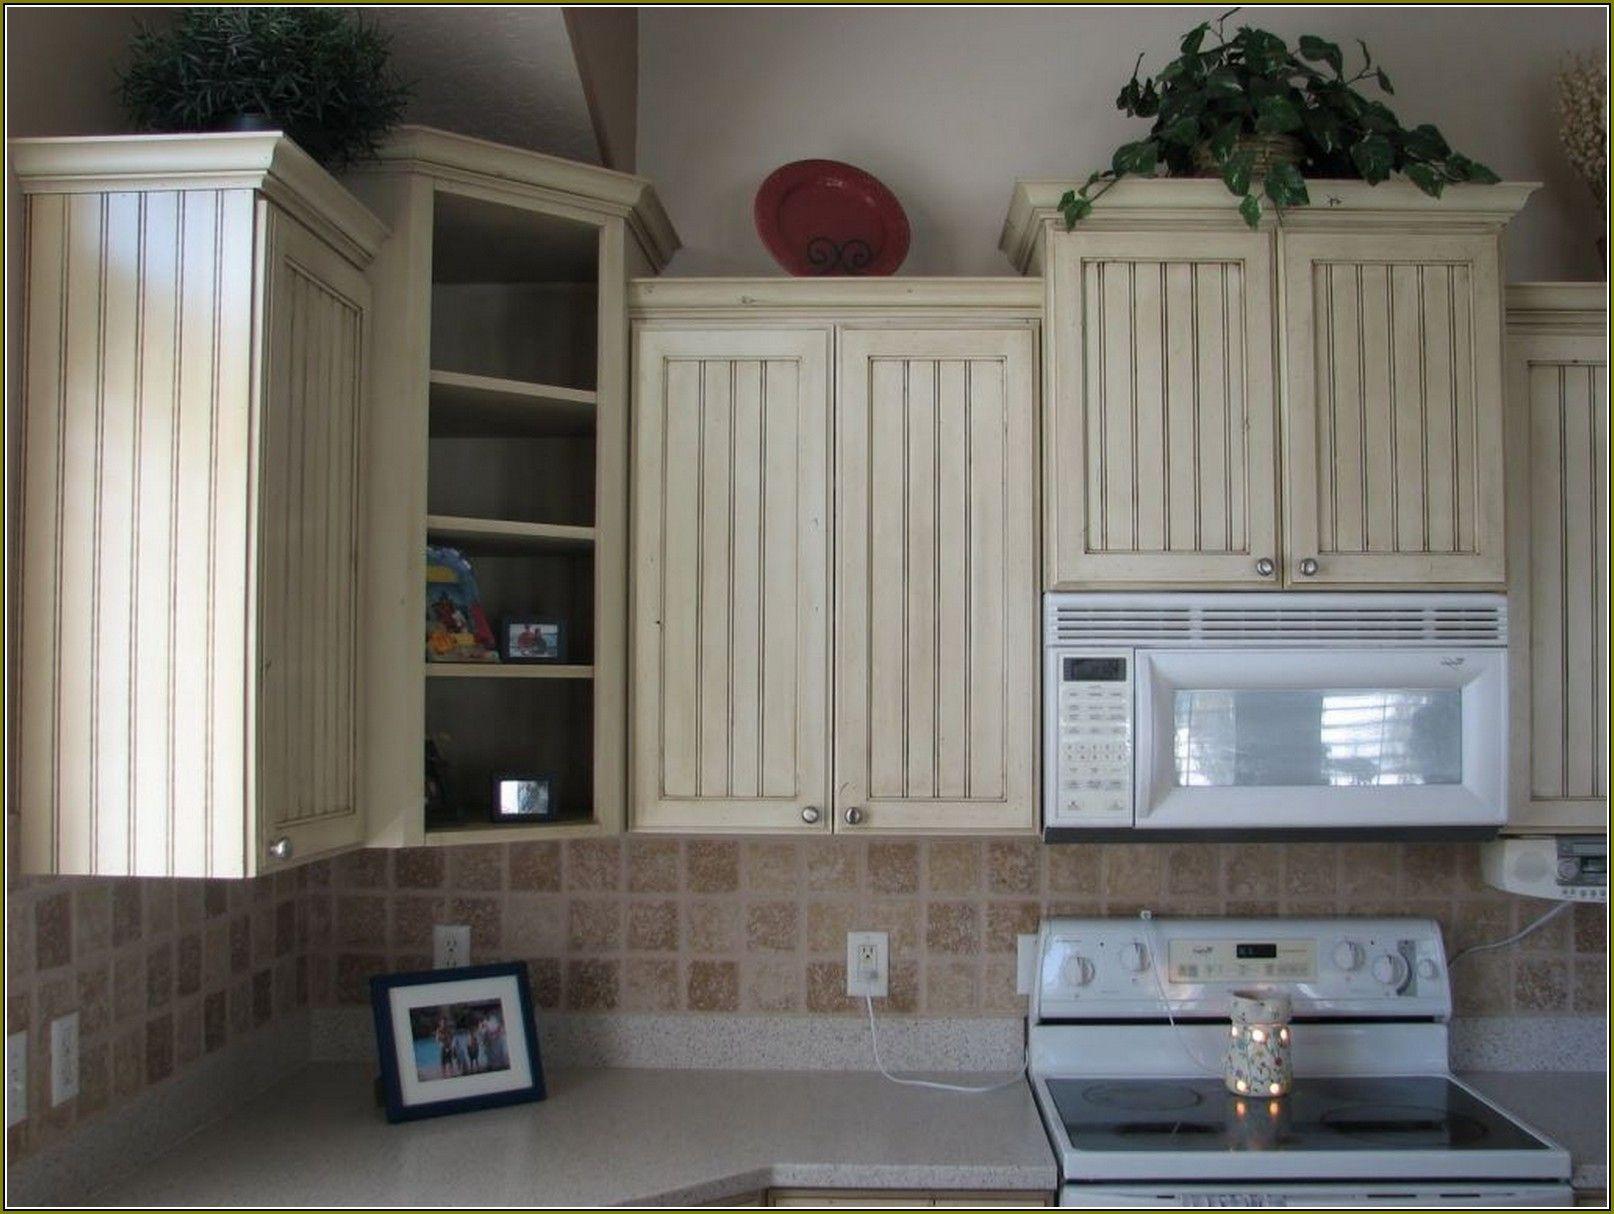 Image Of Diy Whitewash Cabinets Diy Cabinets Whitewash Kitchen Cabinets Kitchen Cabinets